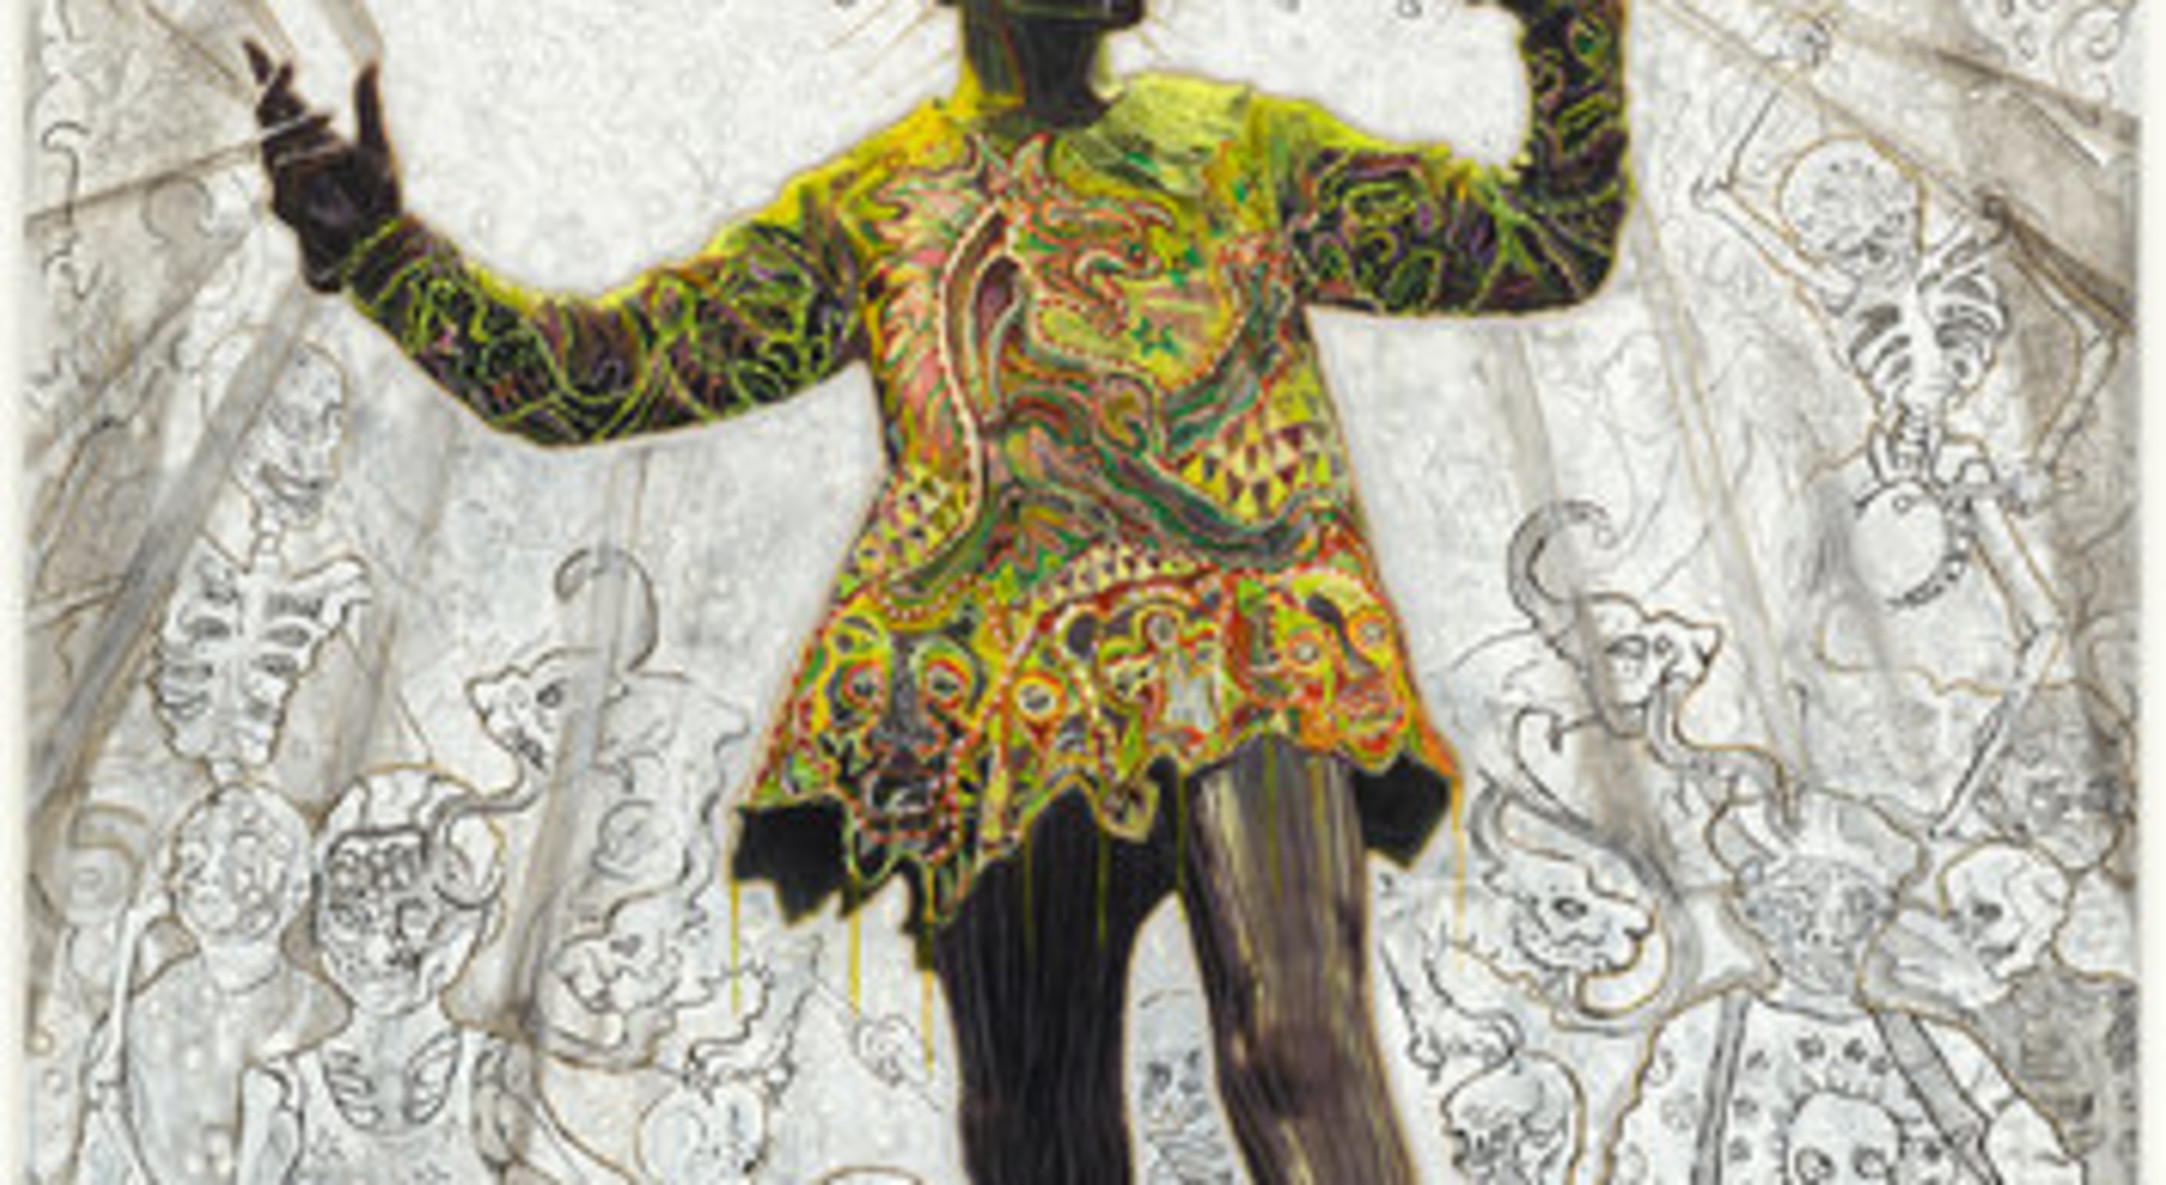 Hew Locke, Pan, 2012, Acrylic on chromogenic print, 197.8 x 147 cm, 77 7/8 x 57 7/8 in